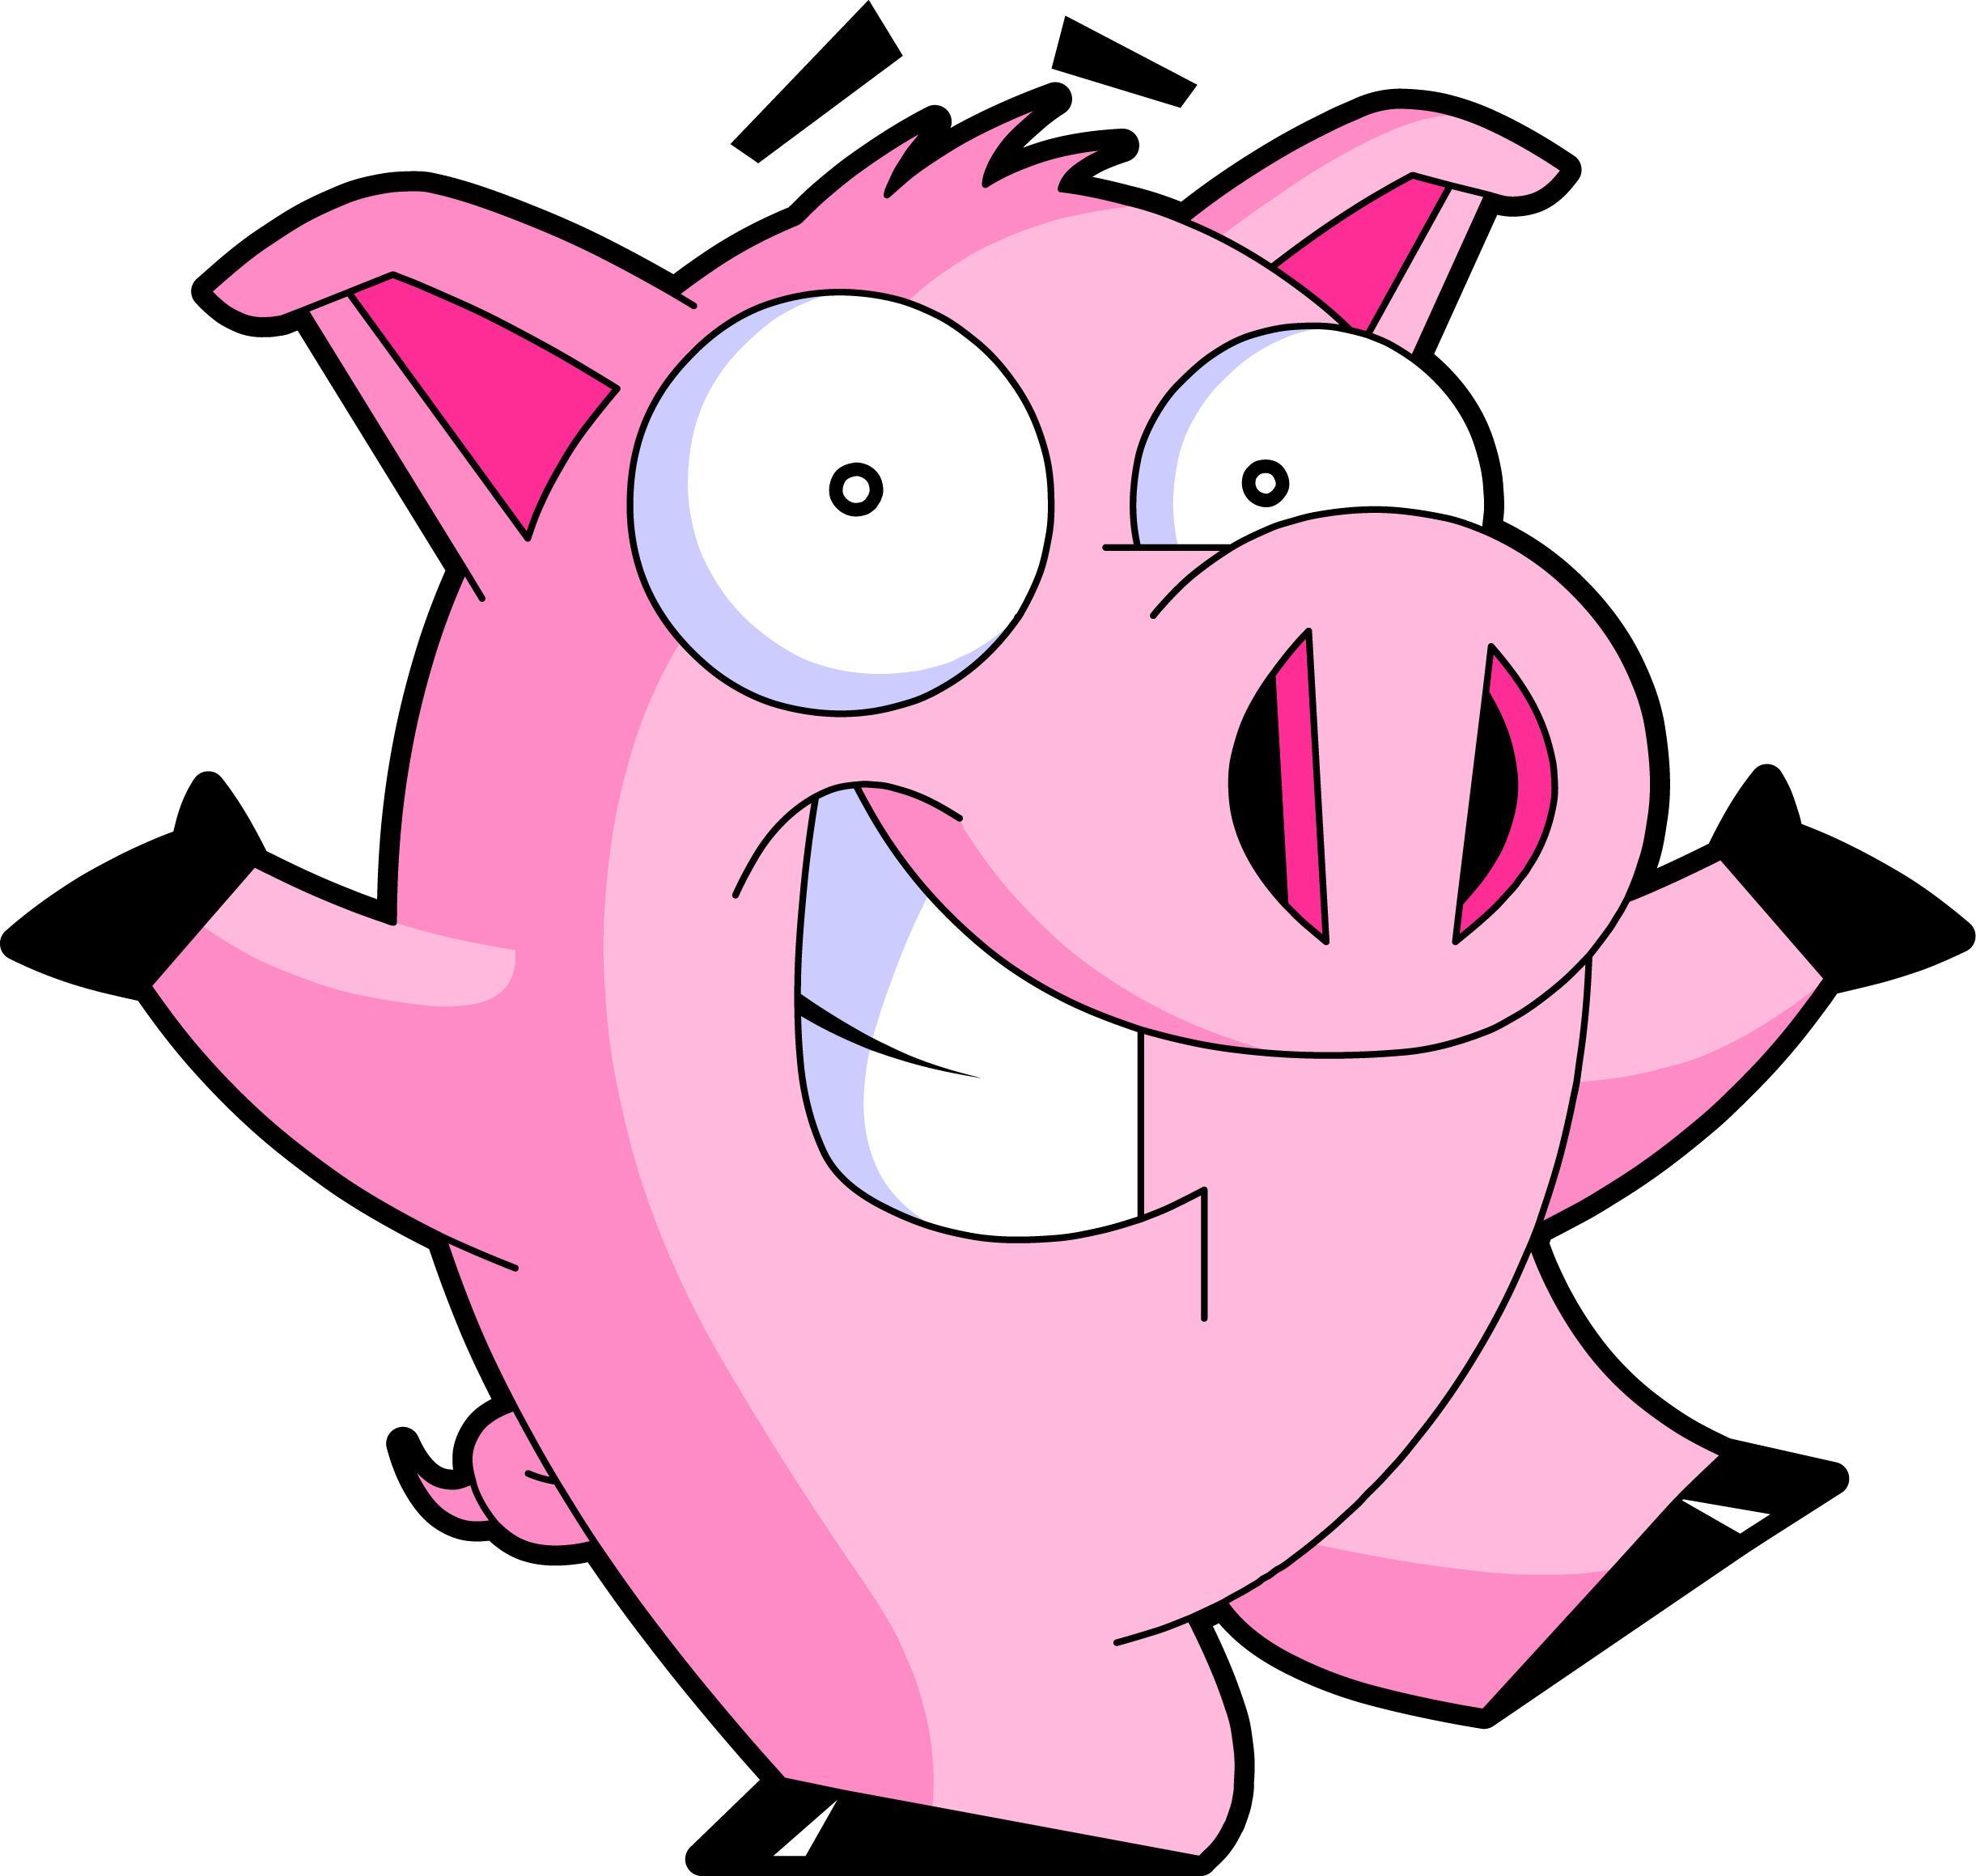 2442x2319 Cute Pig Face Clip Art Free Clipart Images